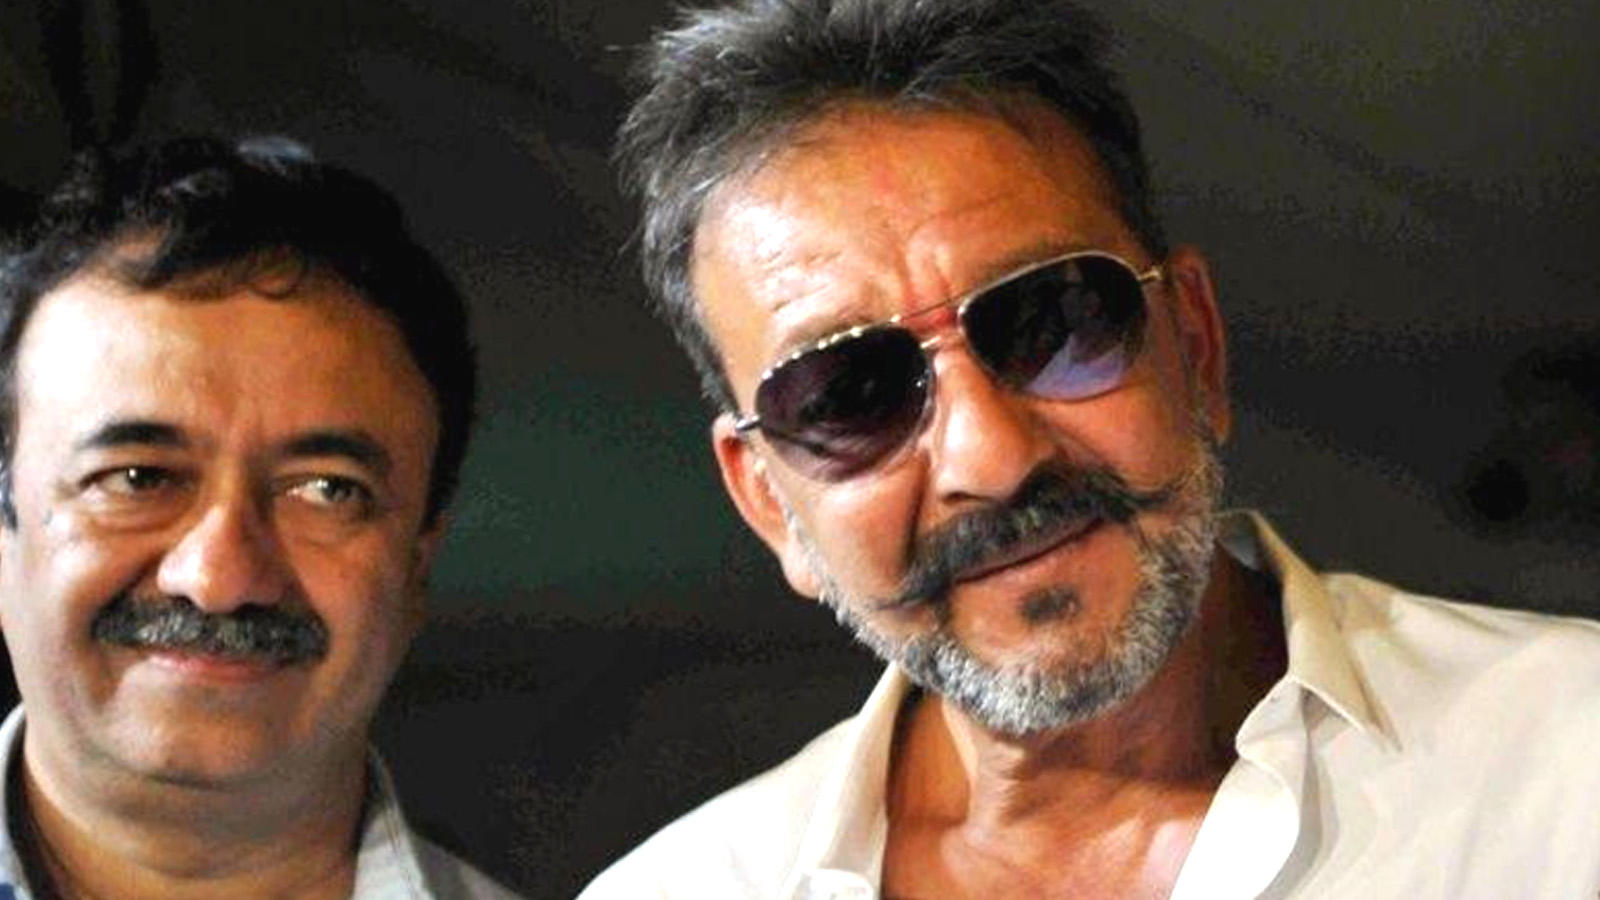 Sanjay Dutt: I don't believe in #MeToo allegations against Rajkumar Hirani